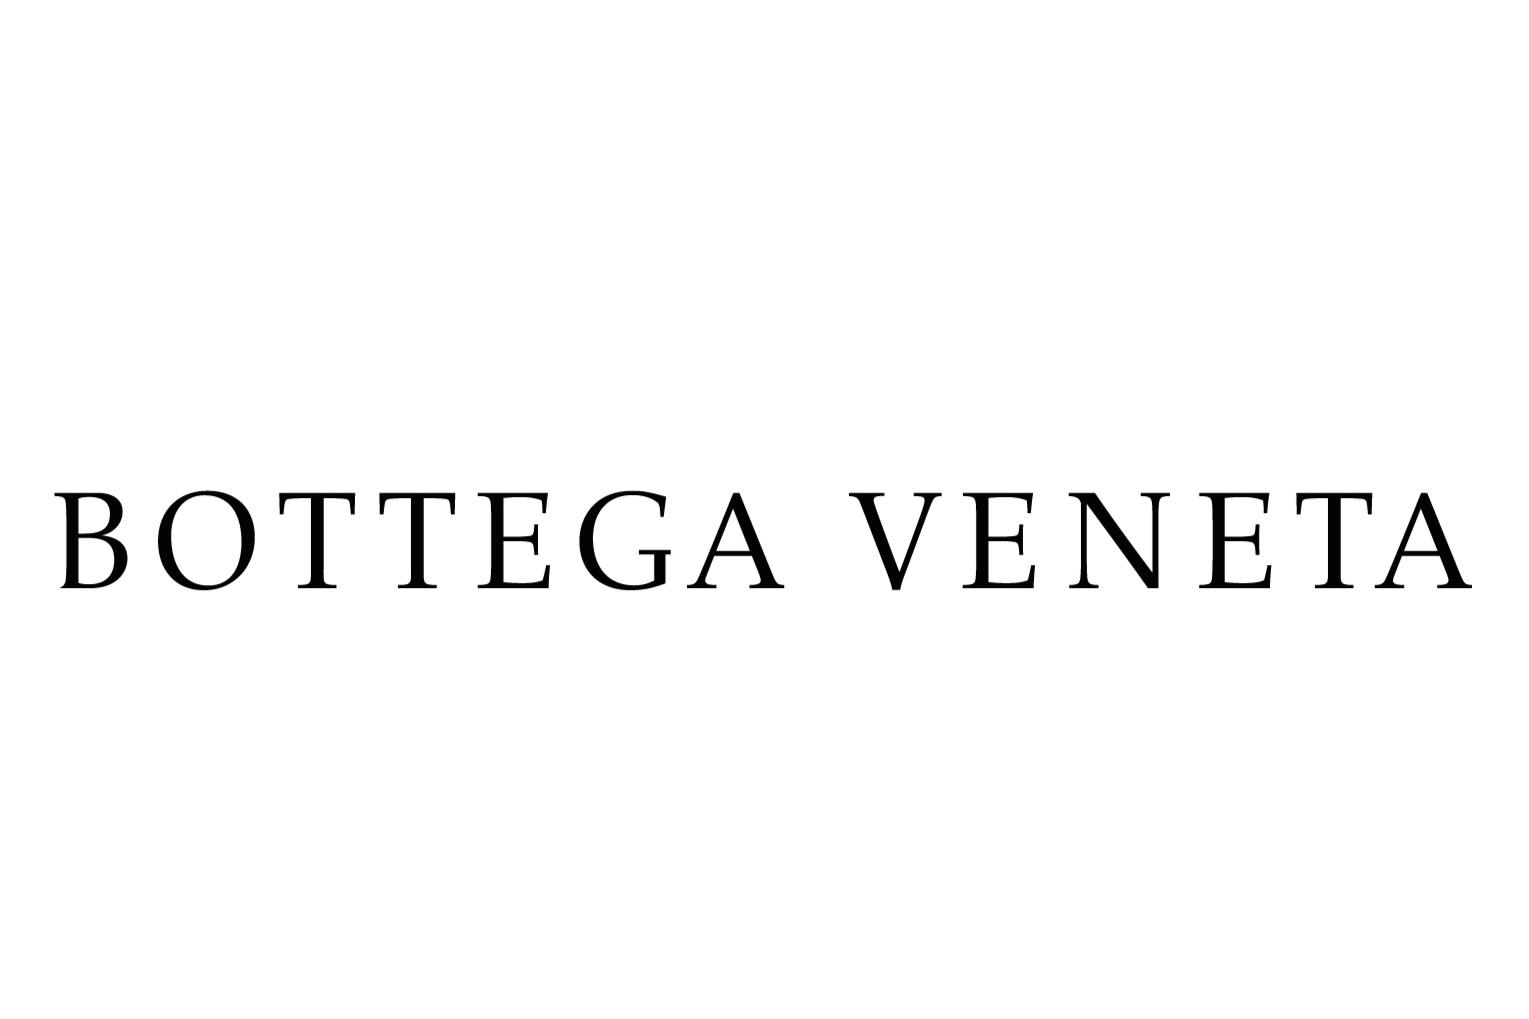 Bottega_Veneta_logo_3.png